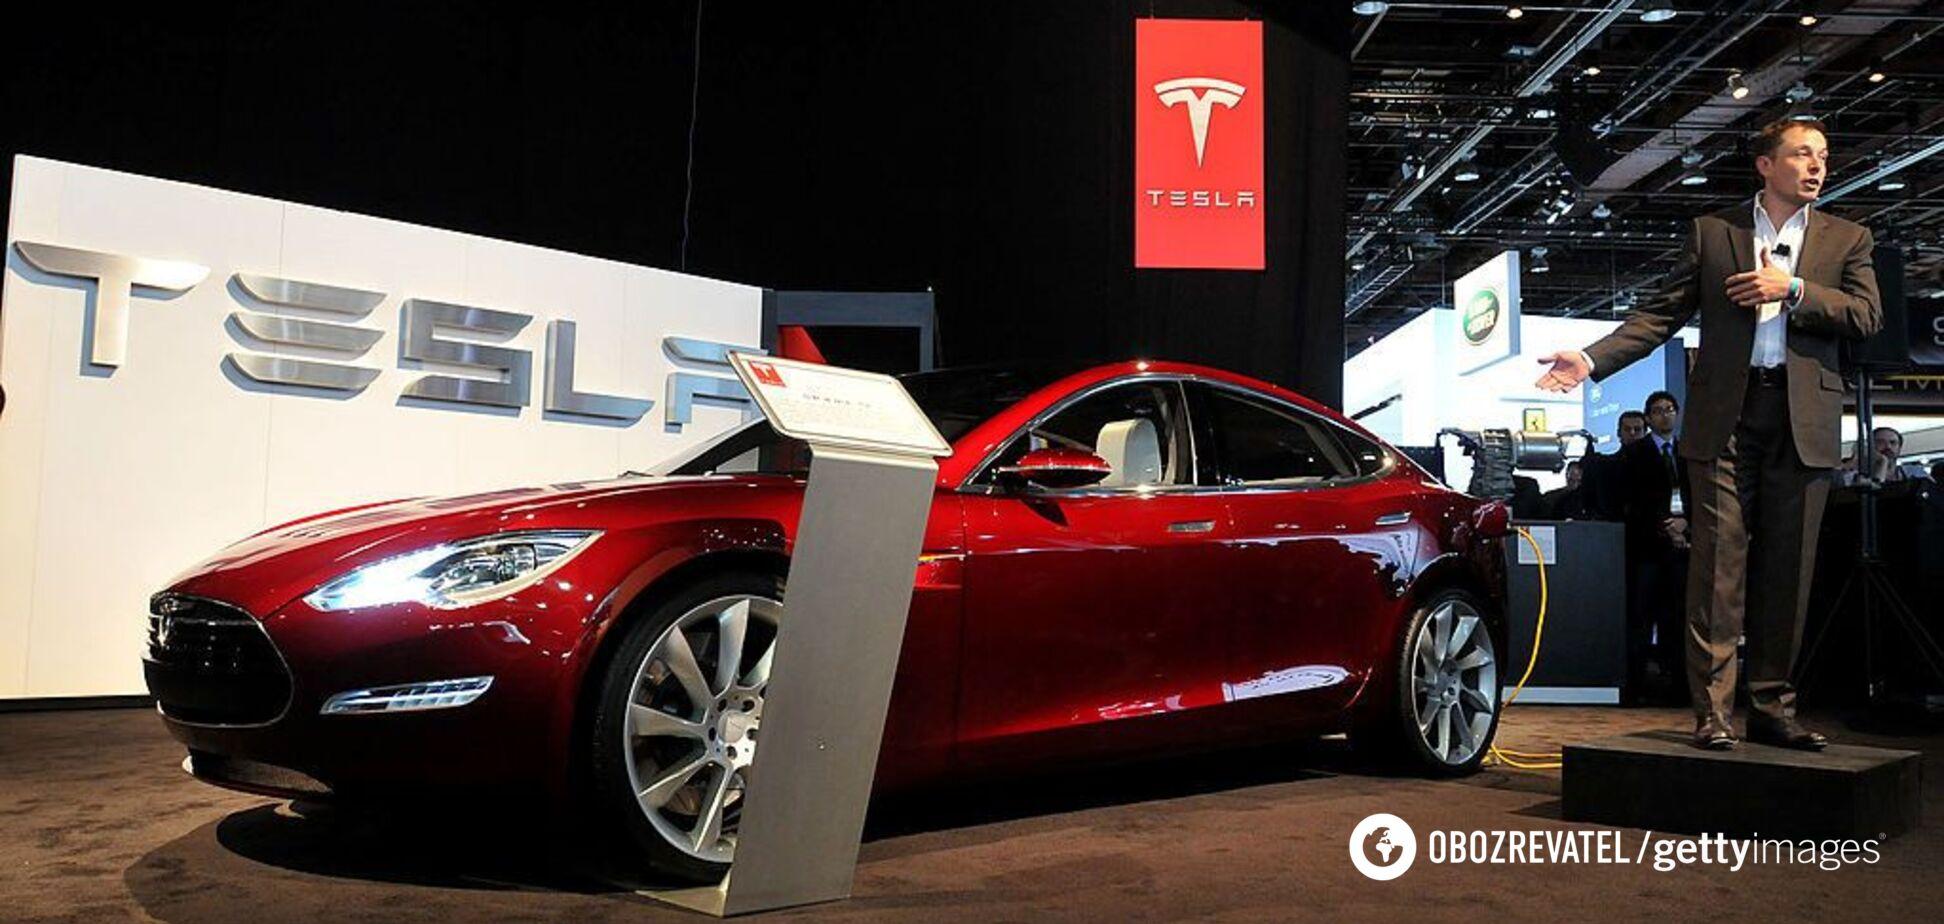 Миллион километров пробега: ученые приготовили для Tesla батареи нового типа